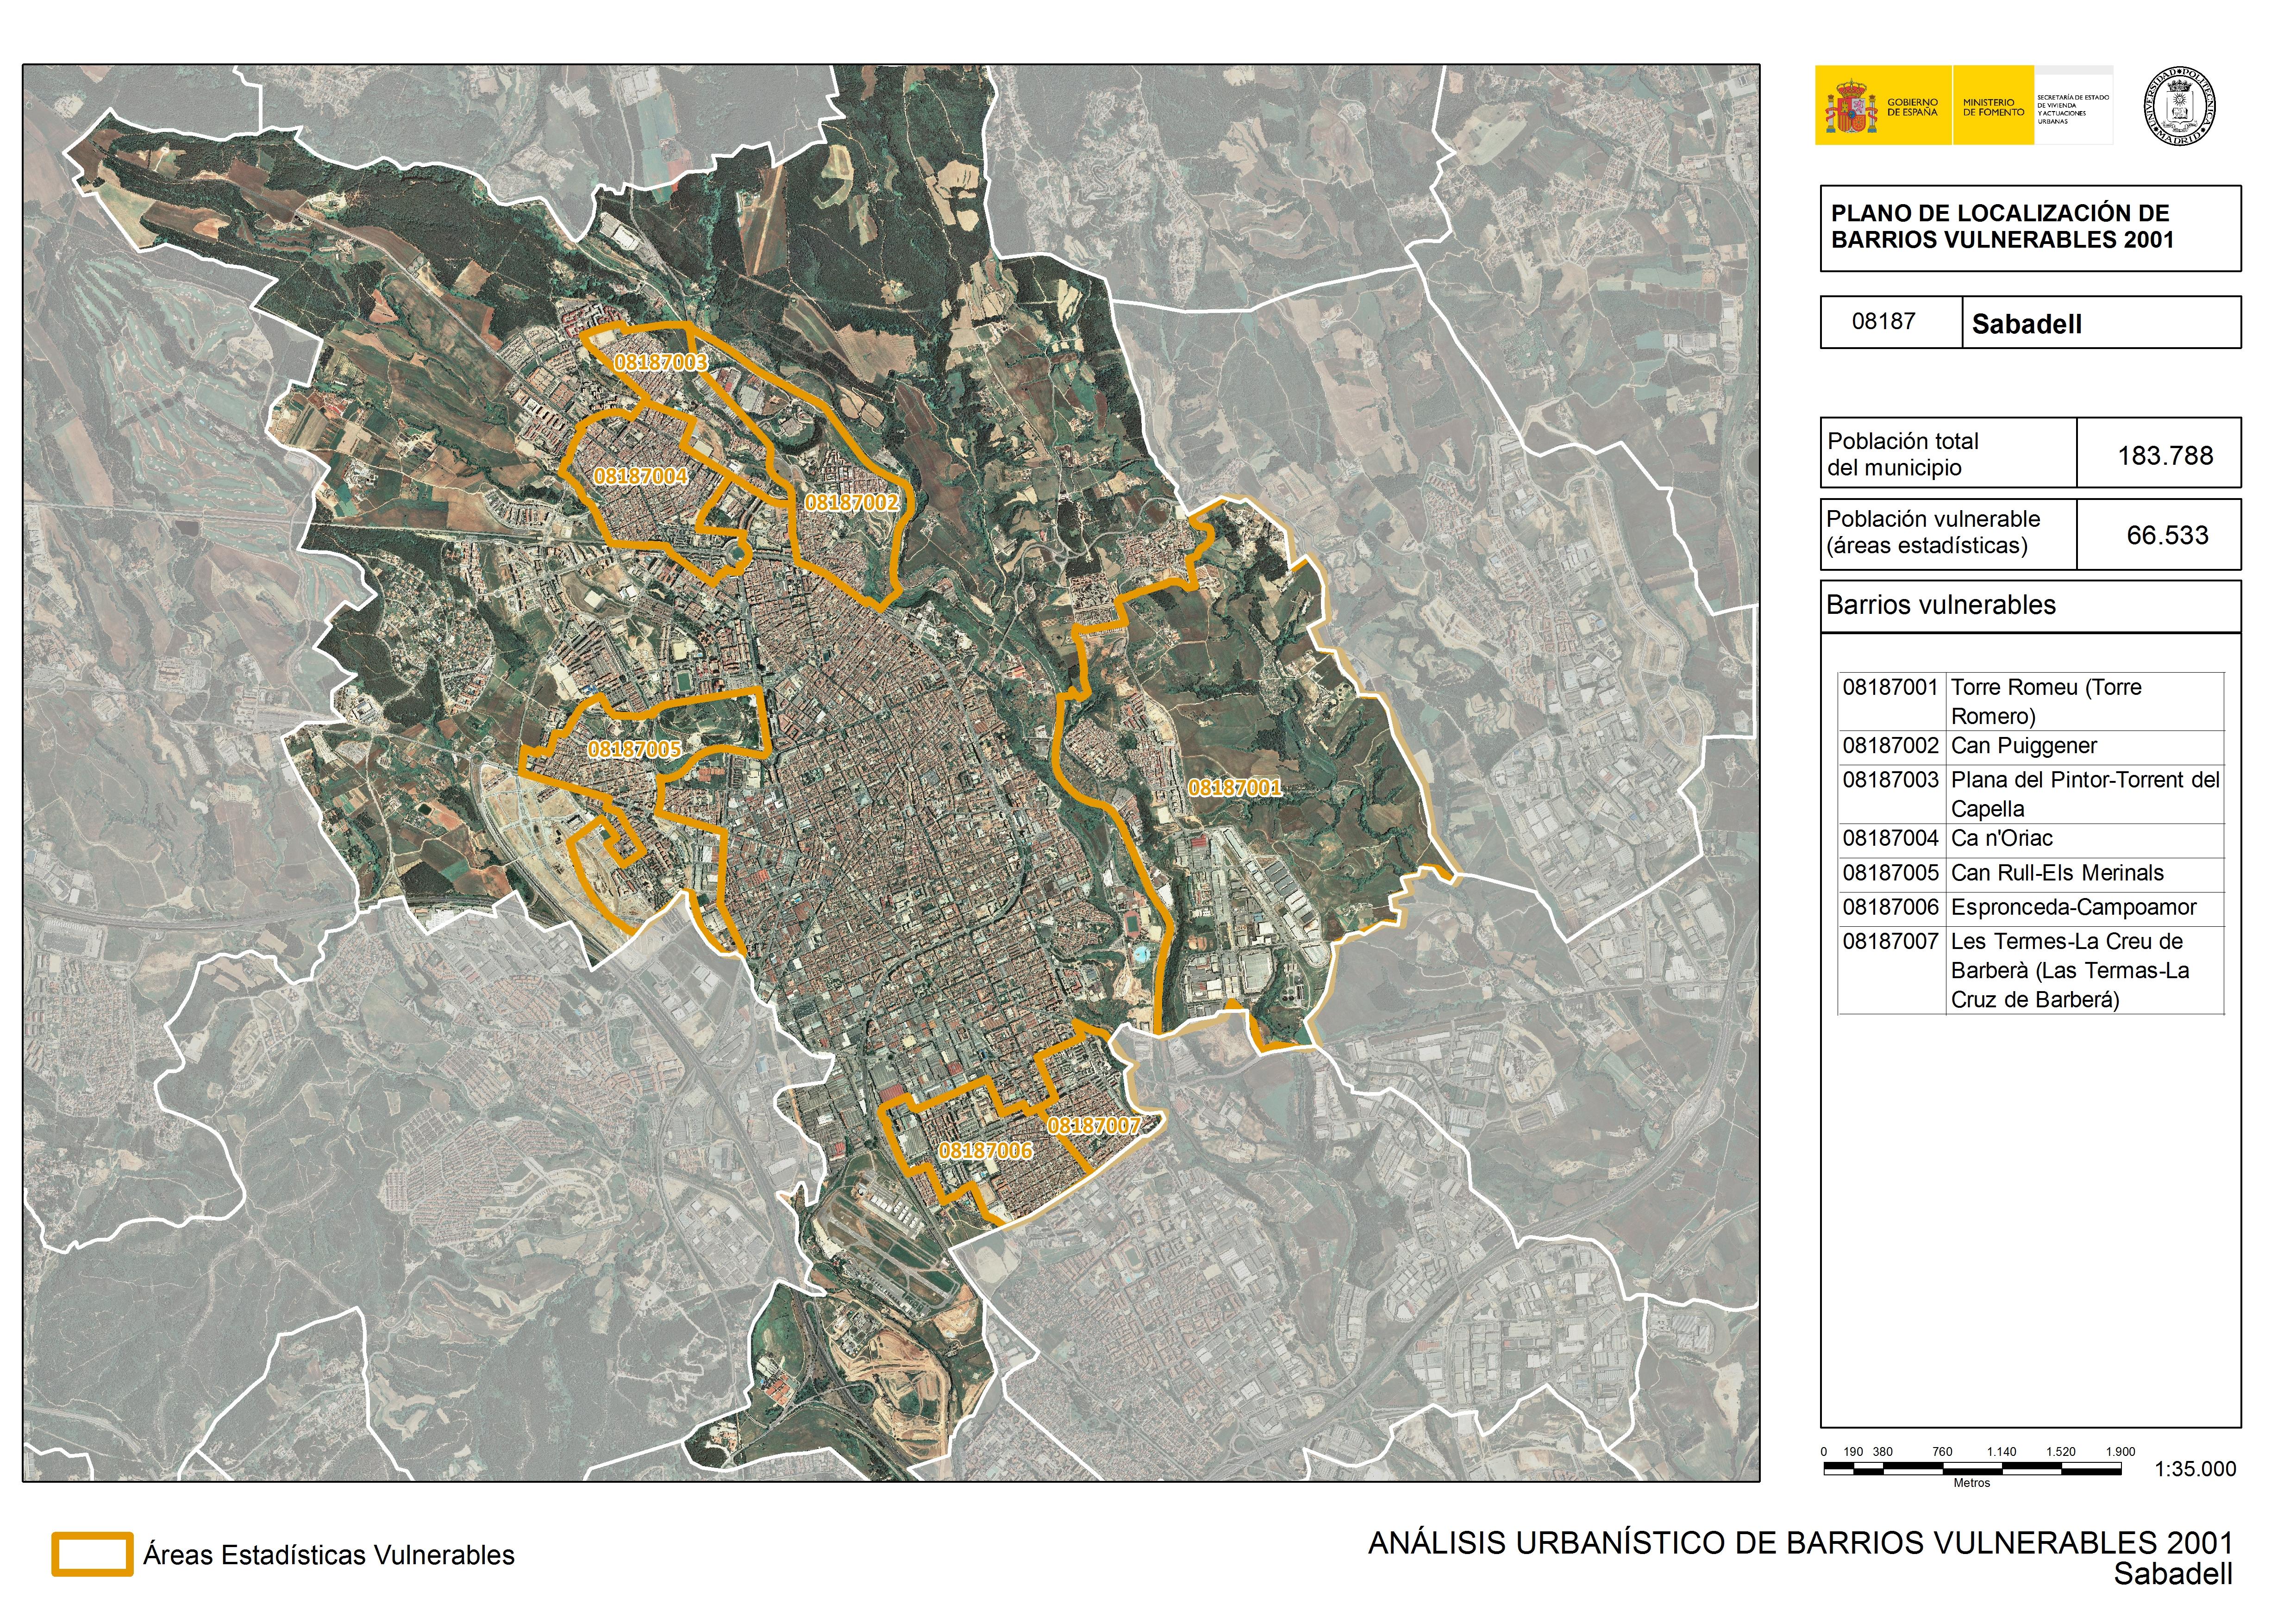 habitat sabadell: